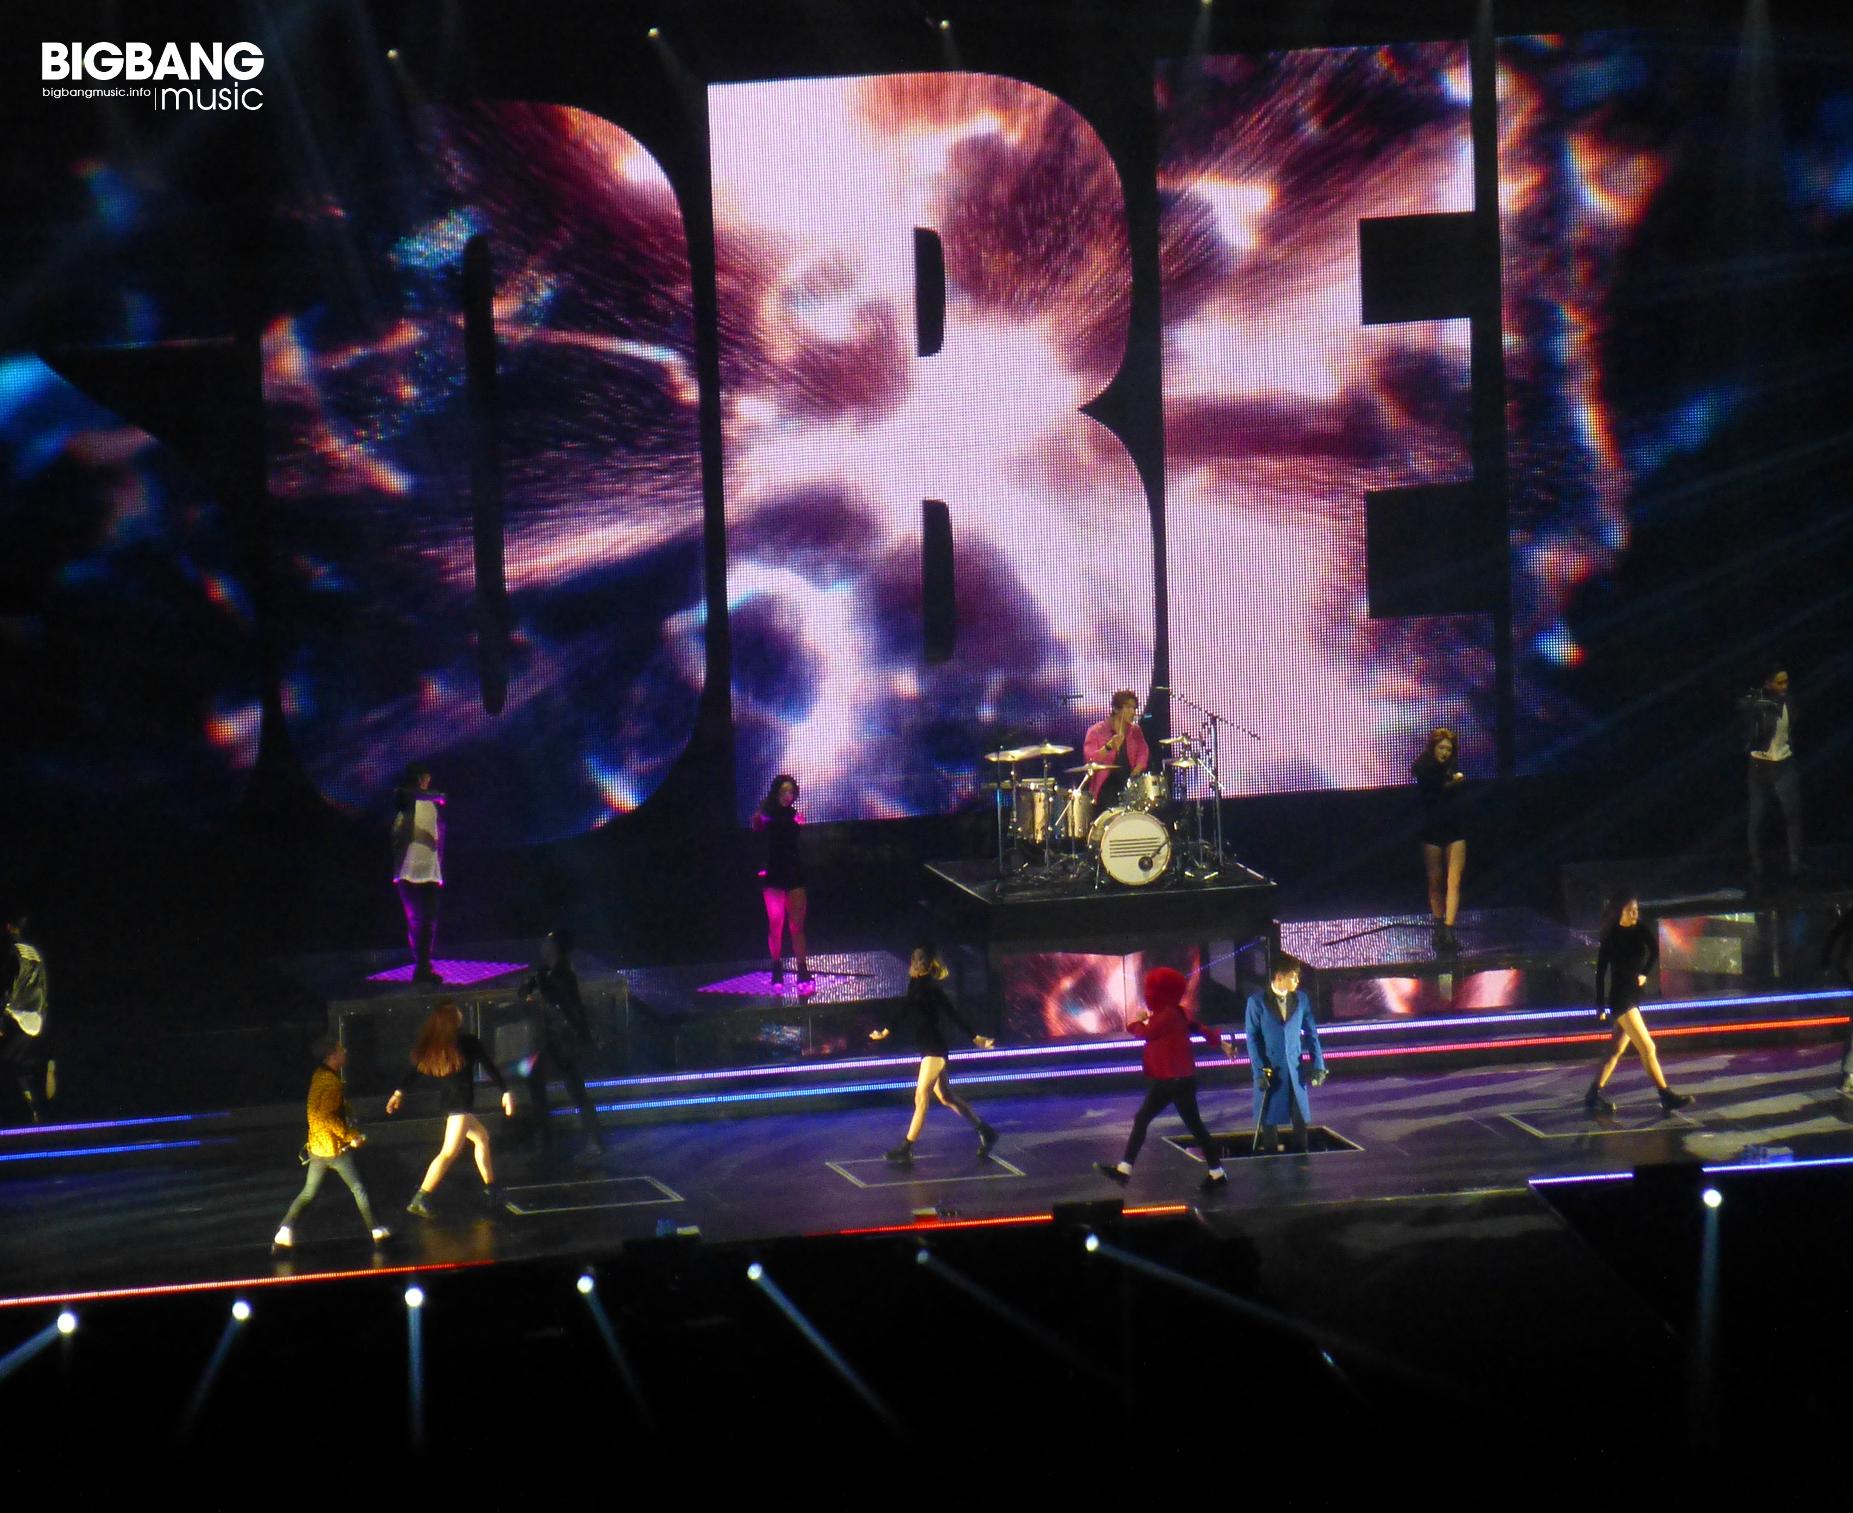 BIGBANG-Osaka-Day-5-2016-01-10-BIGBANG-02.jpg